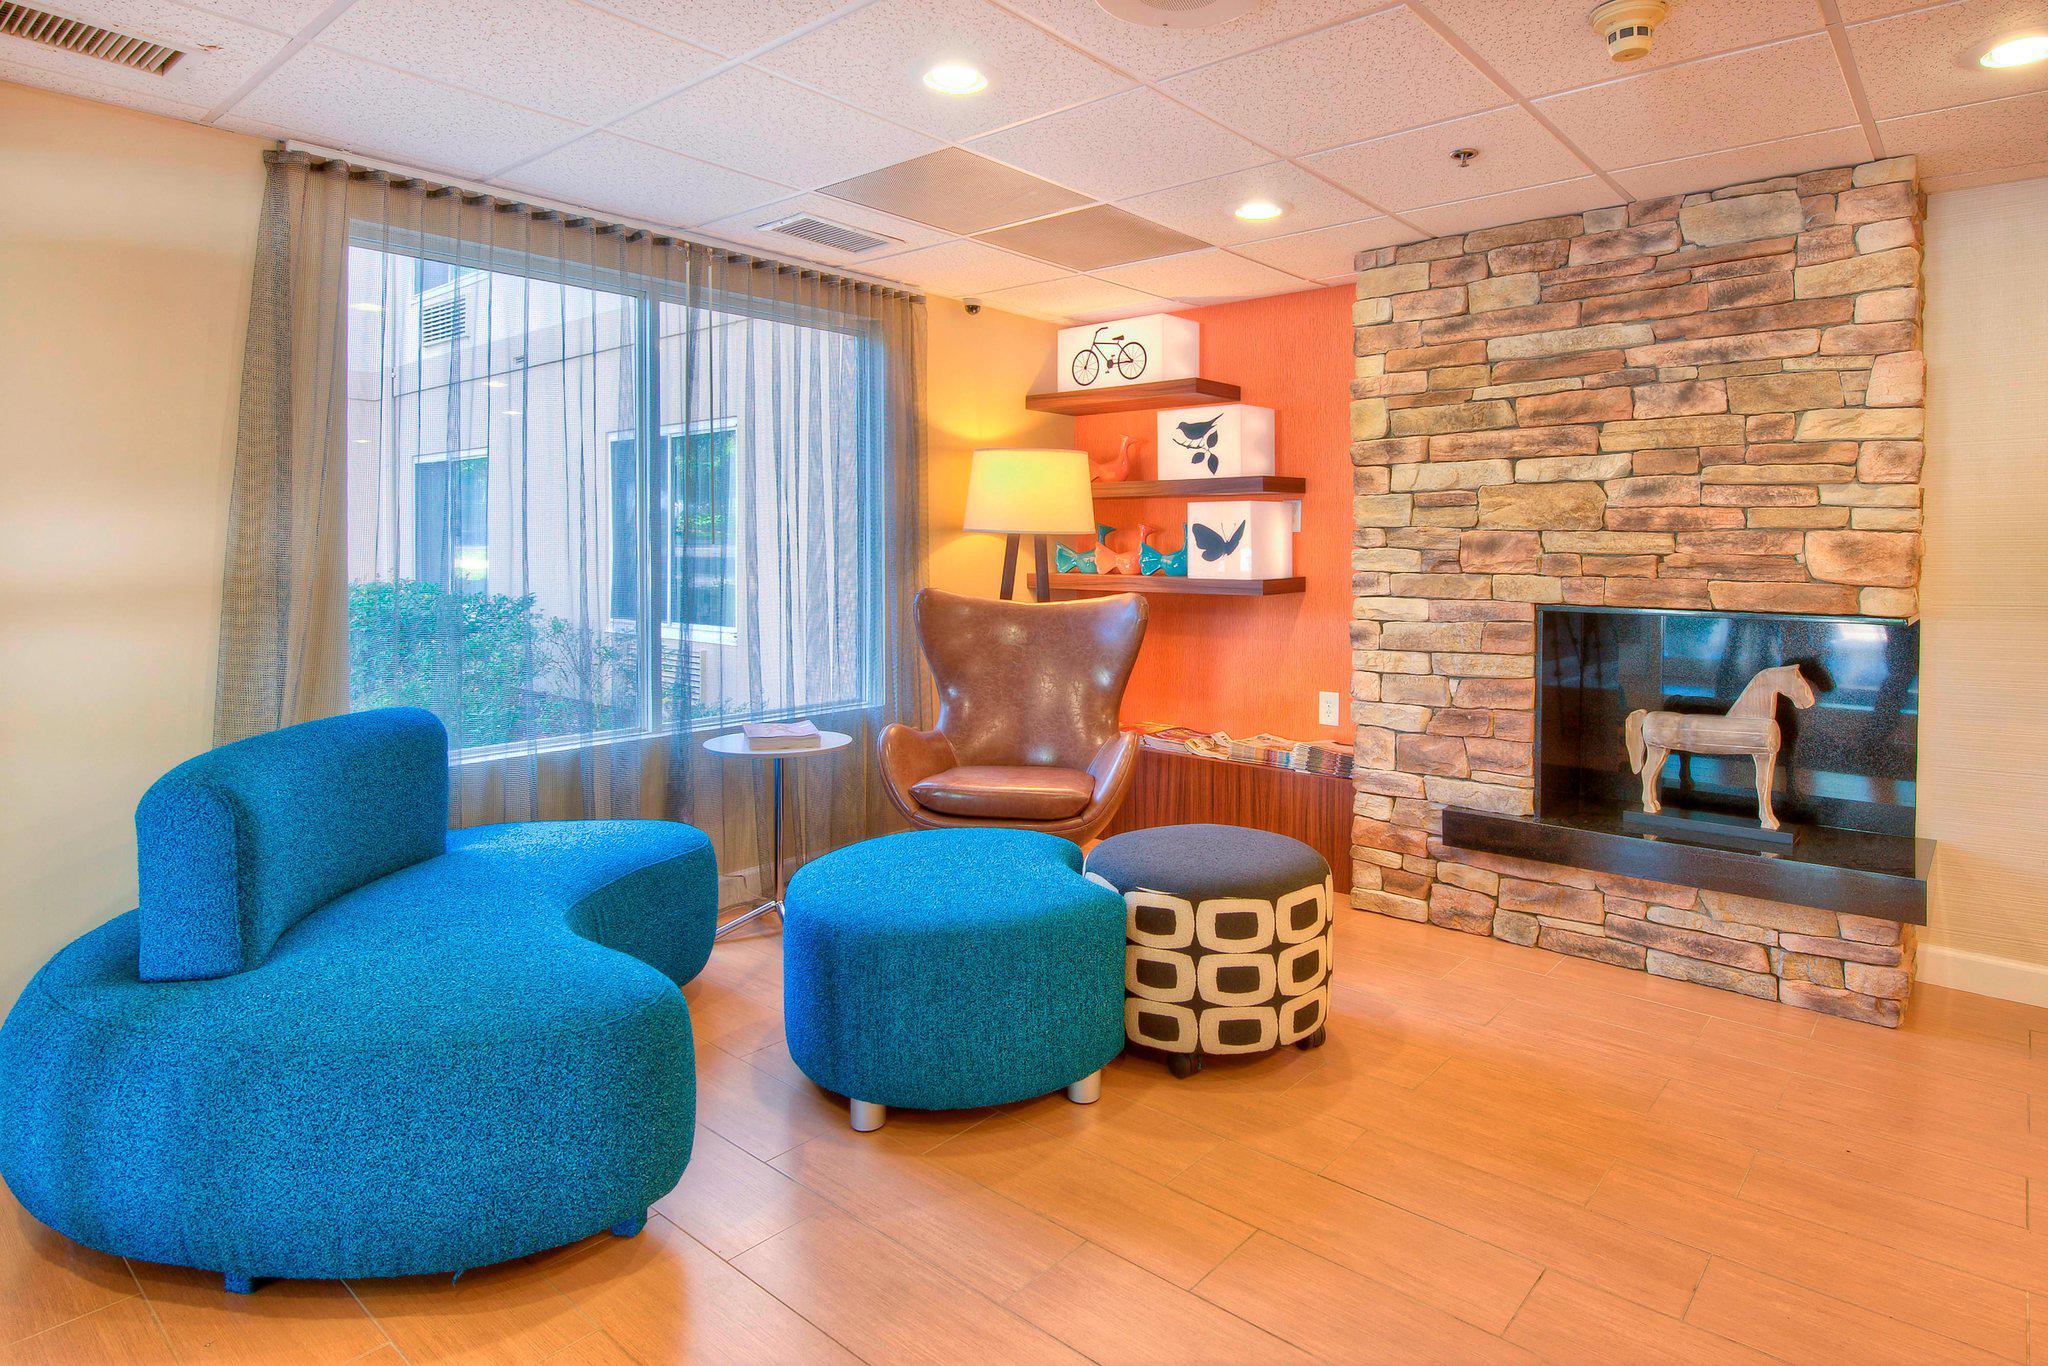 Fairfield Inn & Suites by Marriott Raleigh Crabtree Valley